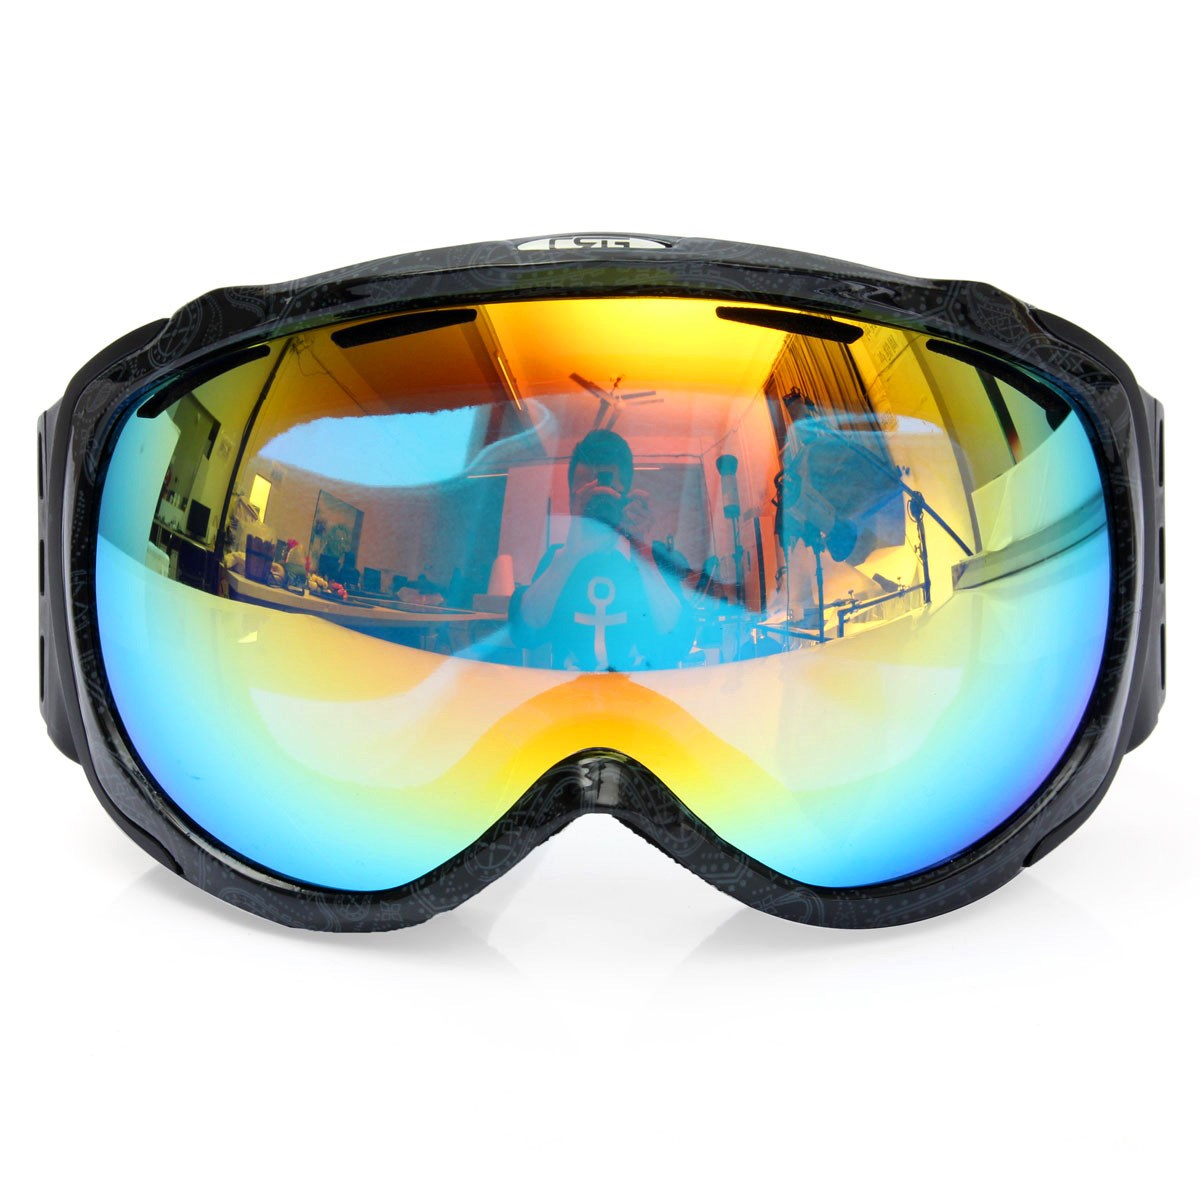 Unisex Professional Spherical Anti fog Dual Lens Outdoor Snowboard font b Ski b font Goggles font